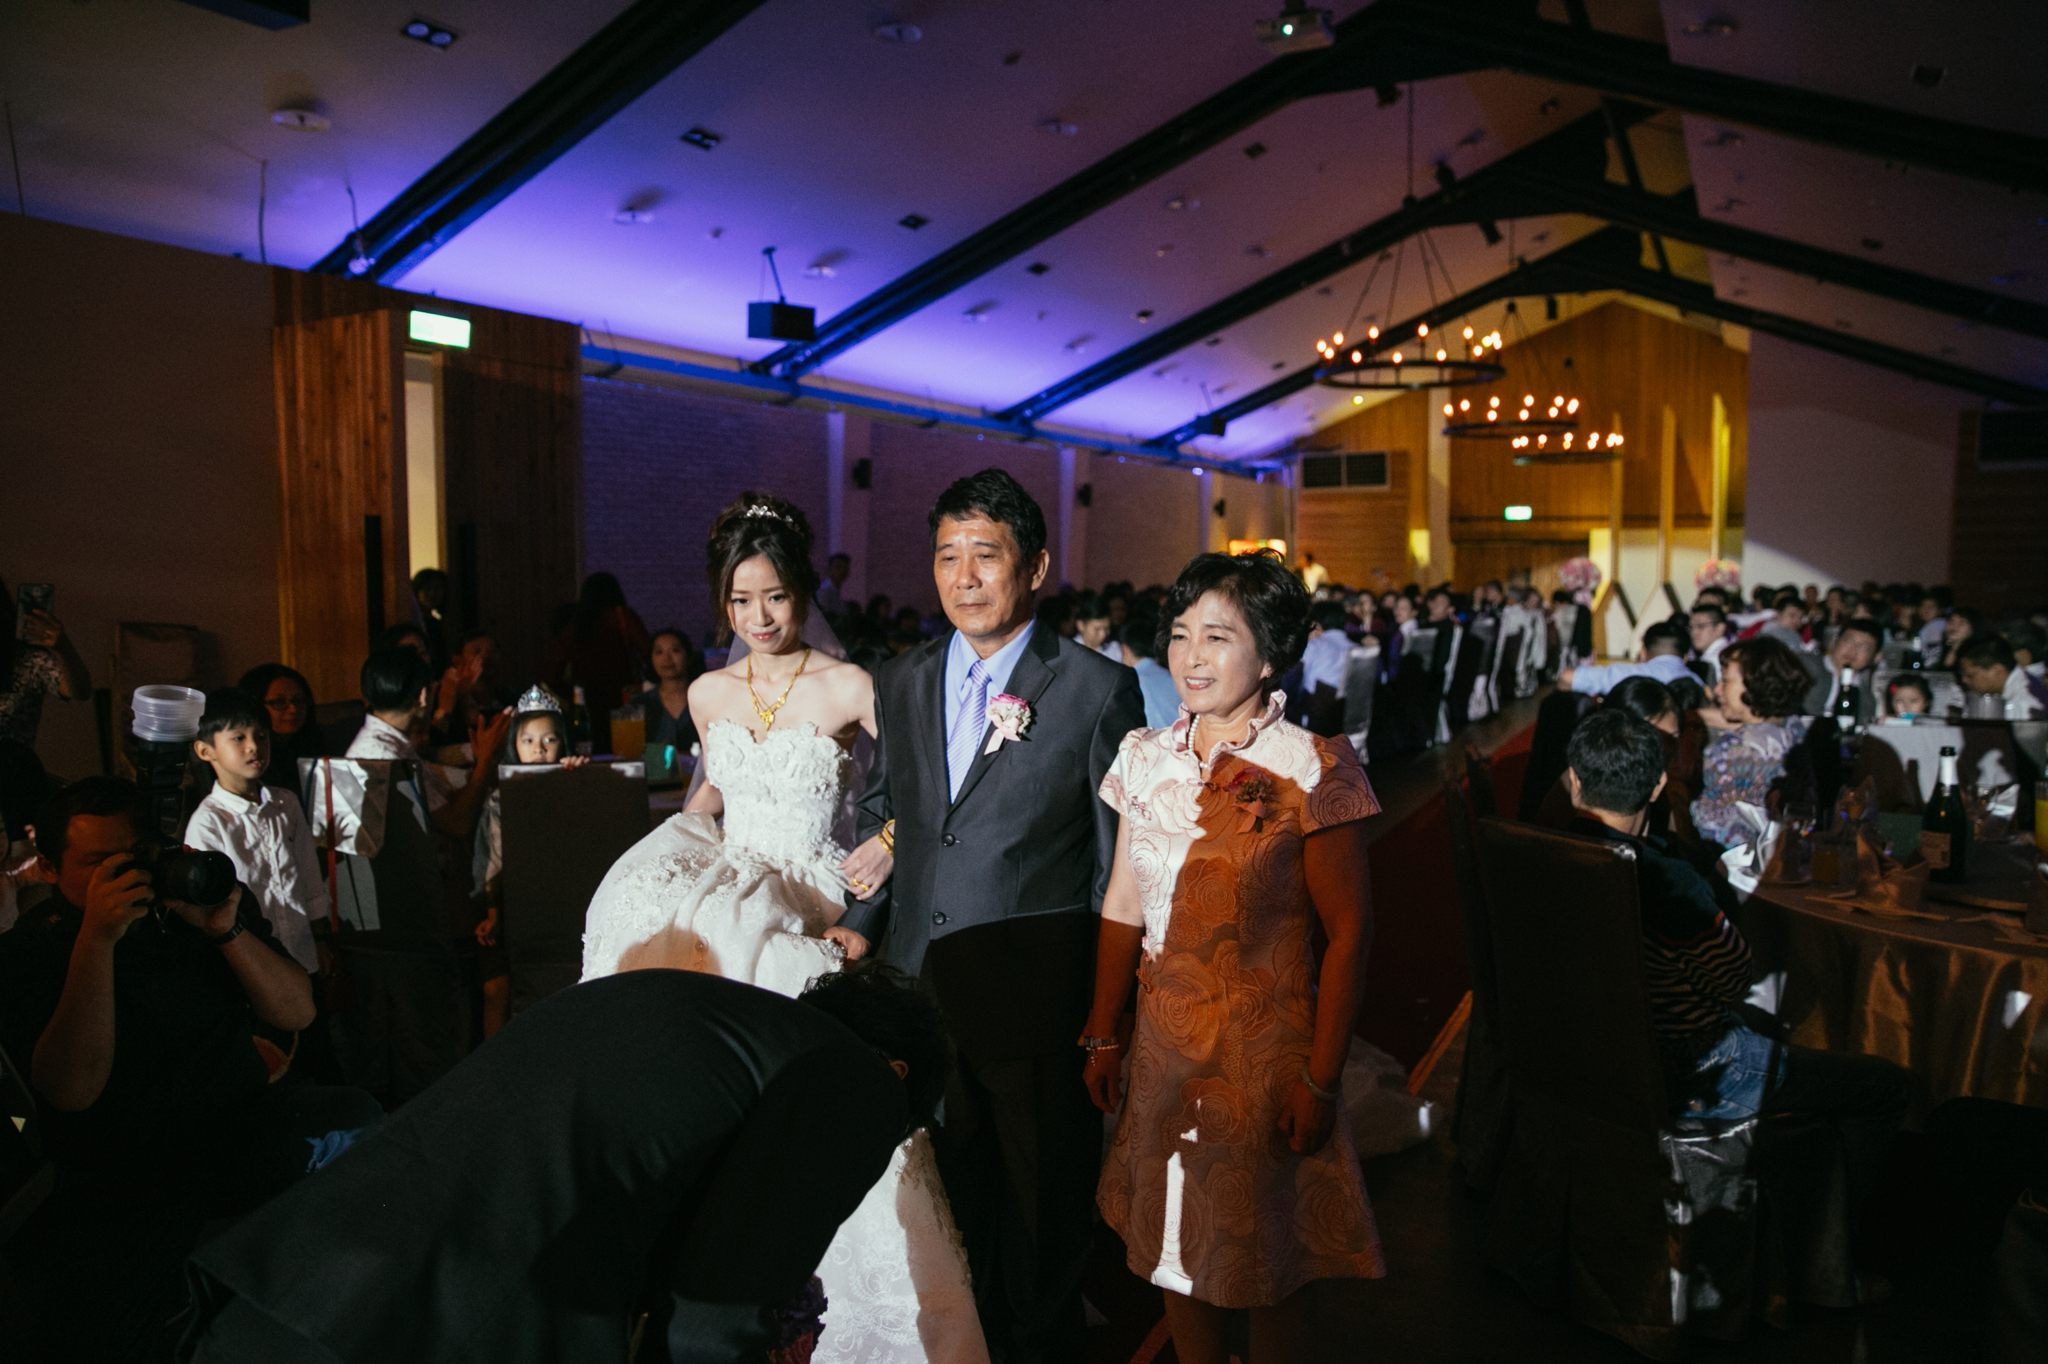 Tina+Nash-wedding-台北婚禮迎娶晚宴-新莊終身大事-122.jpg